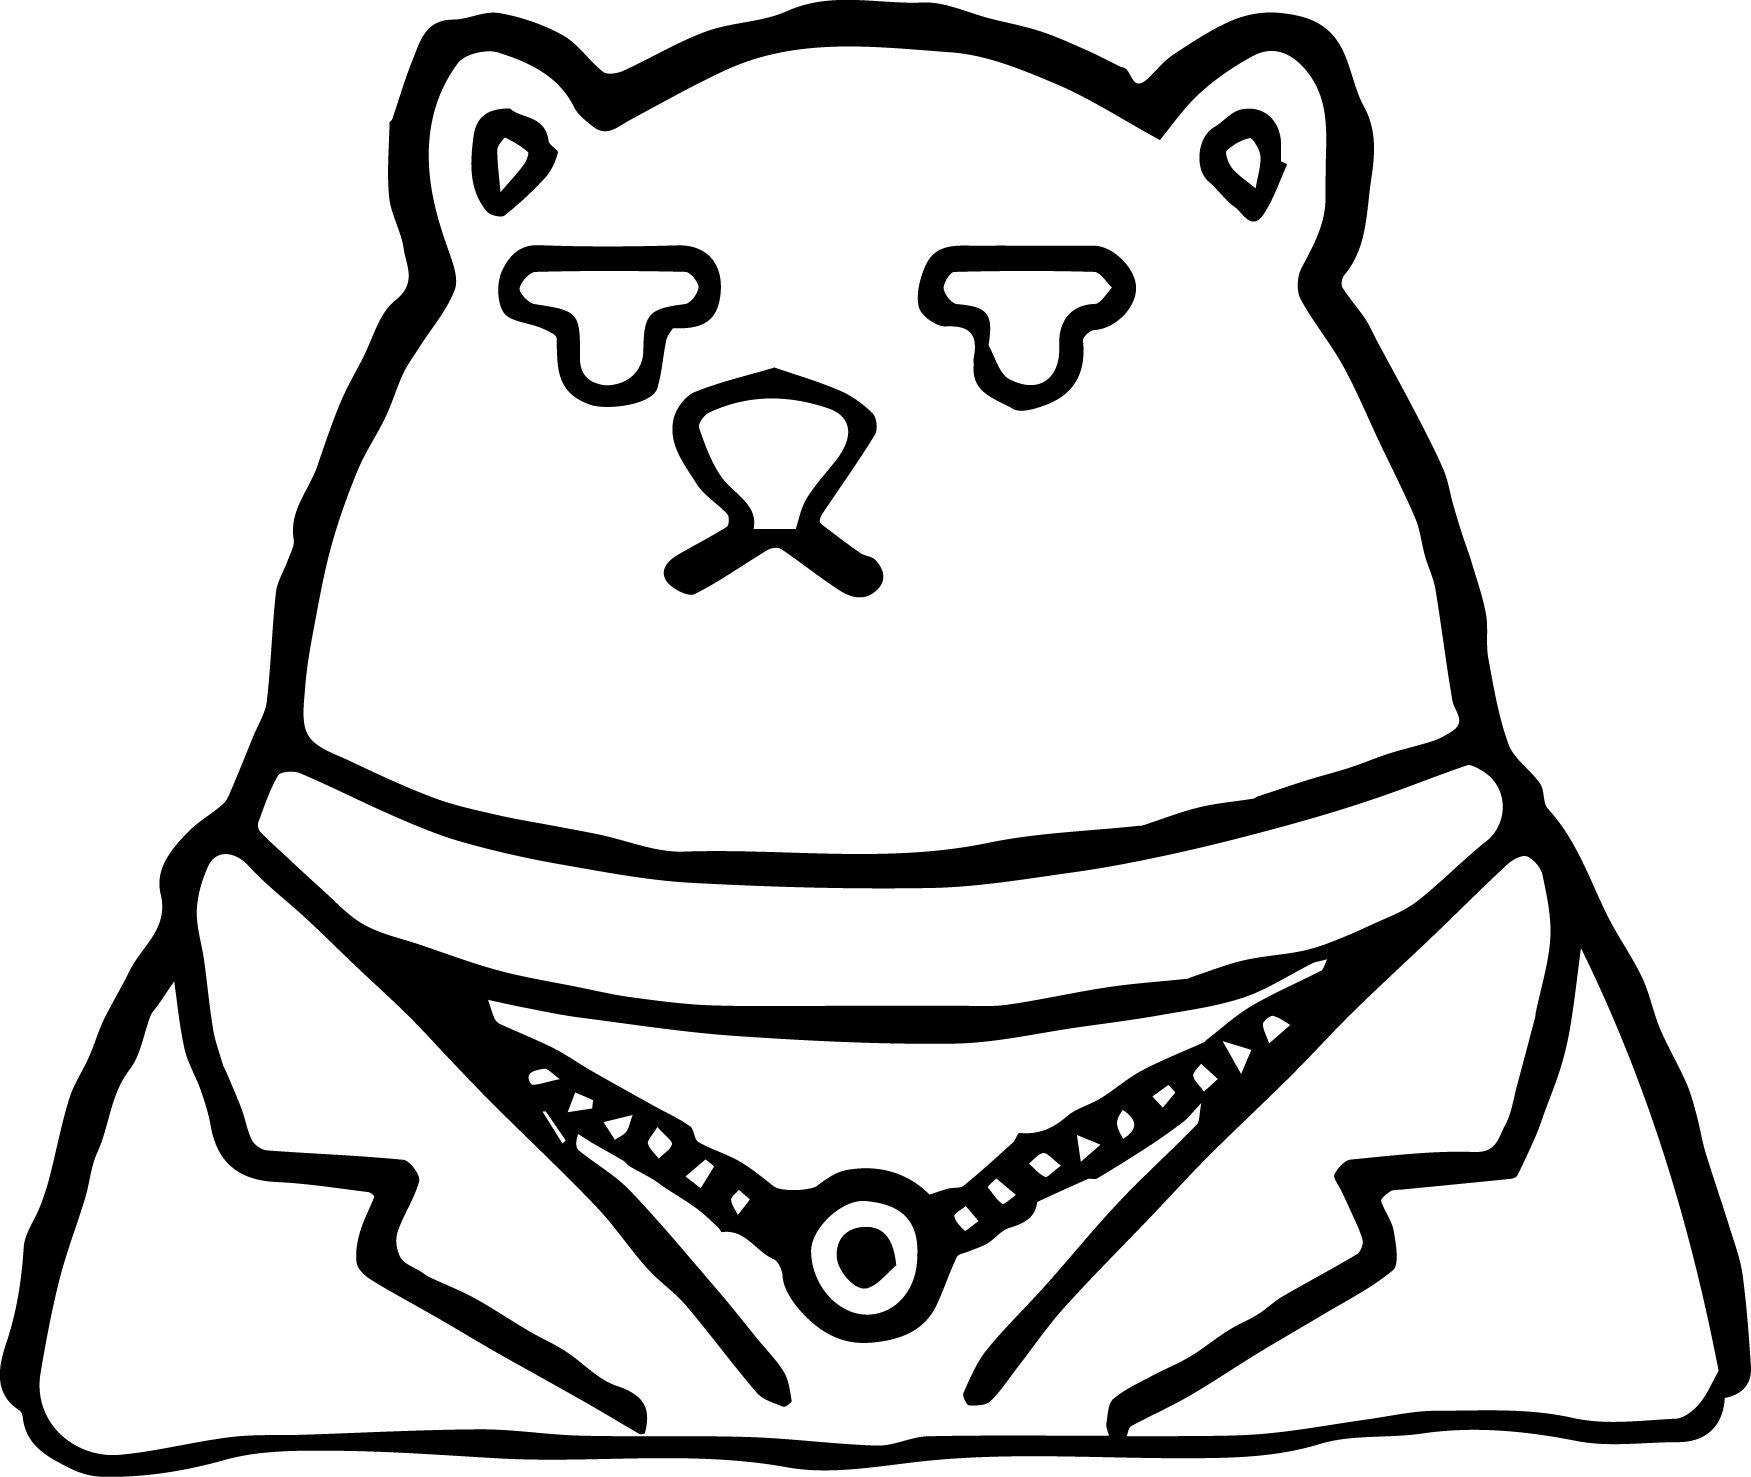 Awesome koslov bear zootopia basic coloring page wecoloringpage